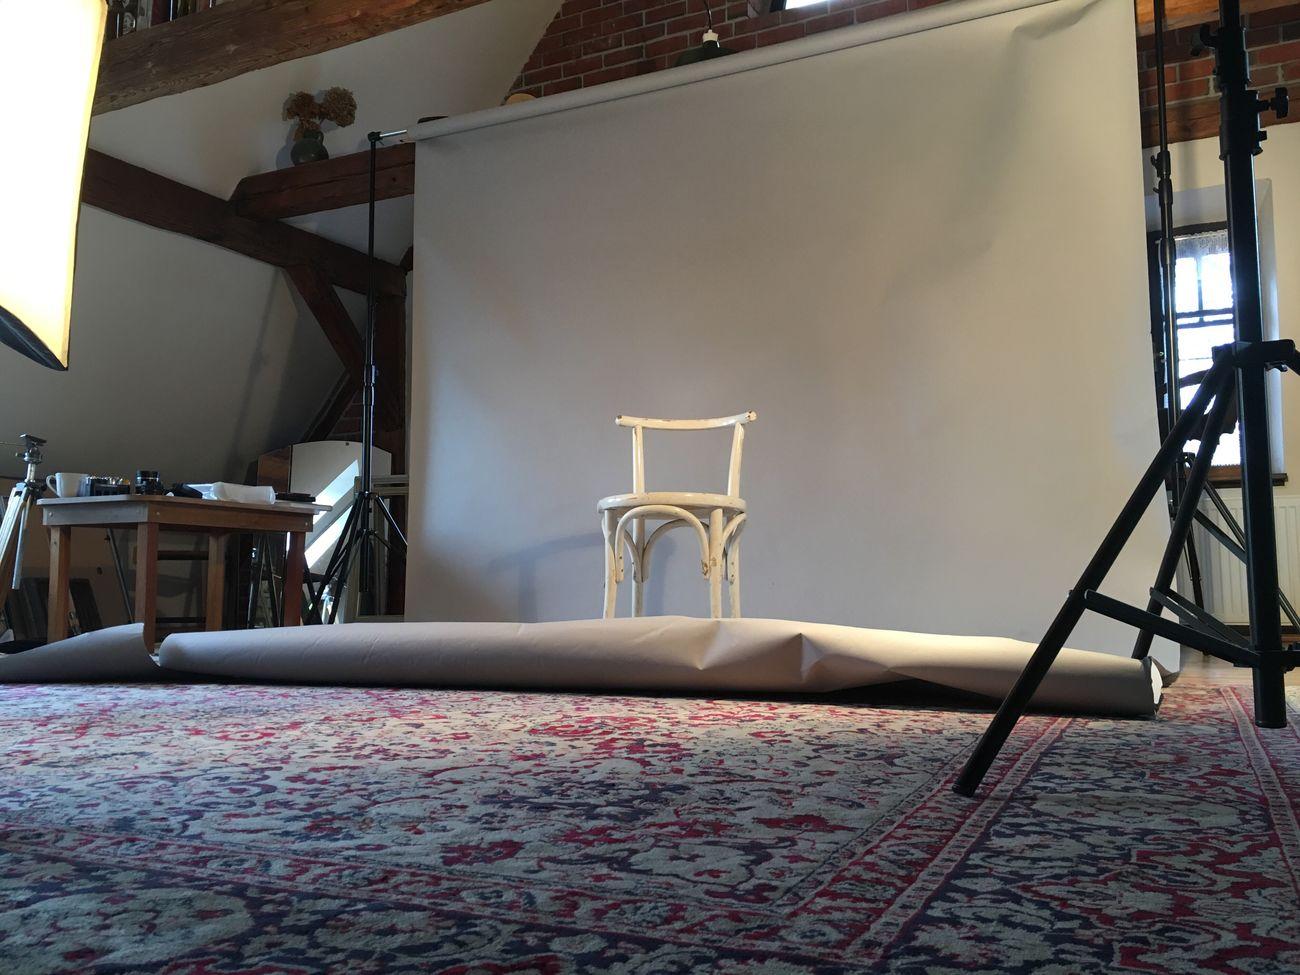 EyeEmNewHere Chair